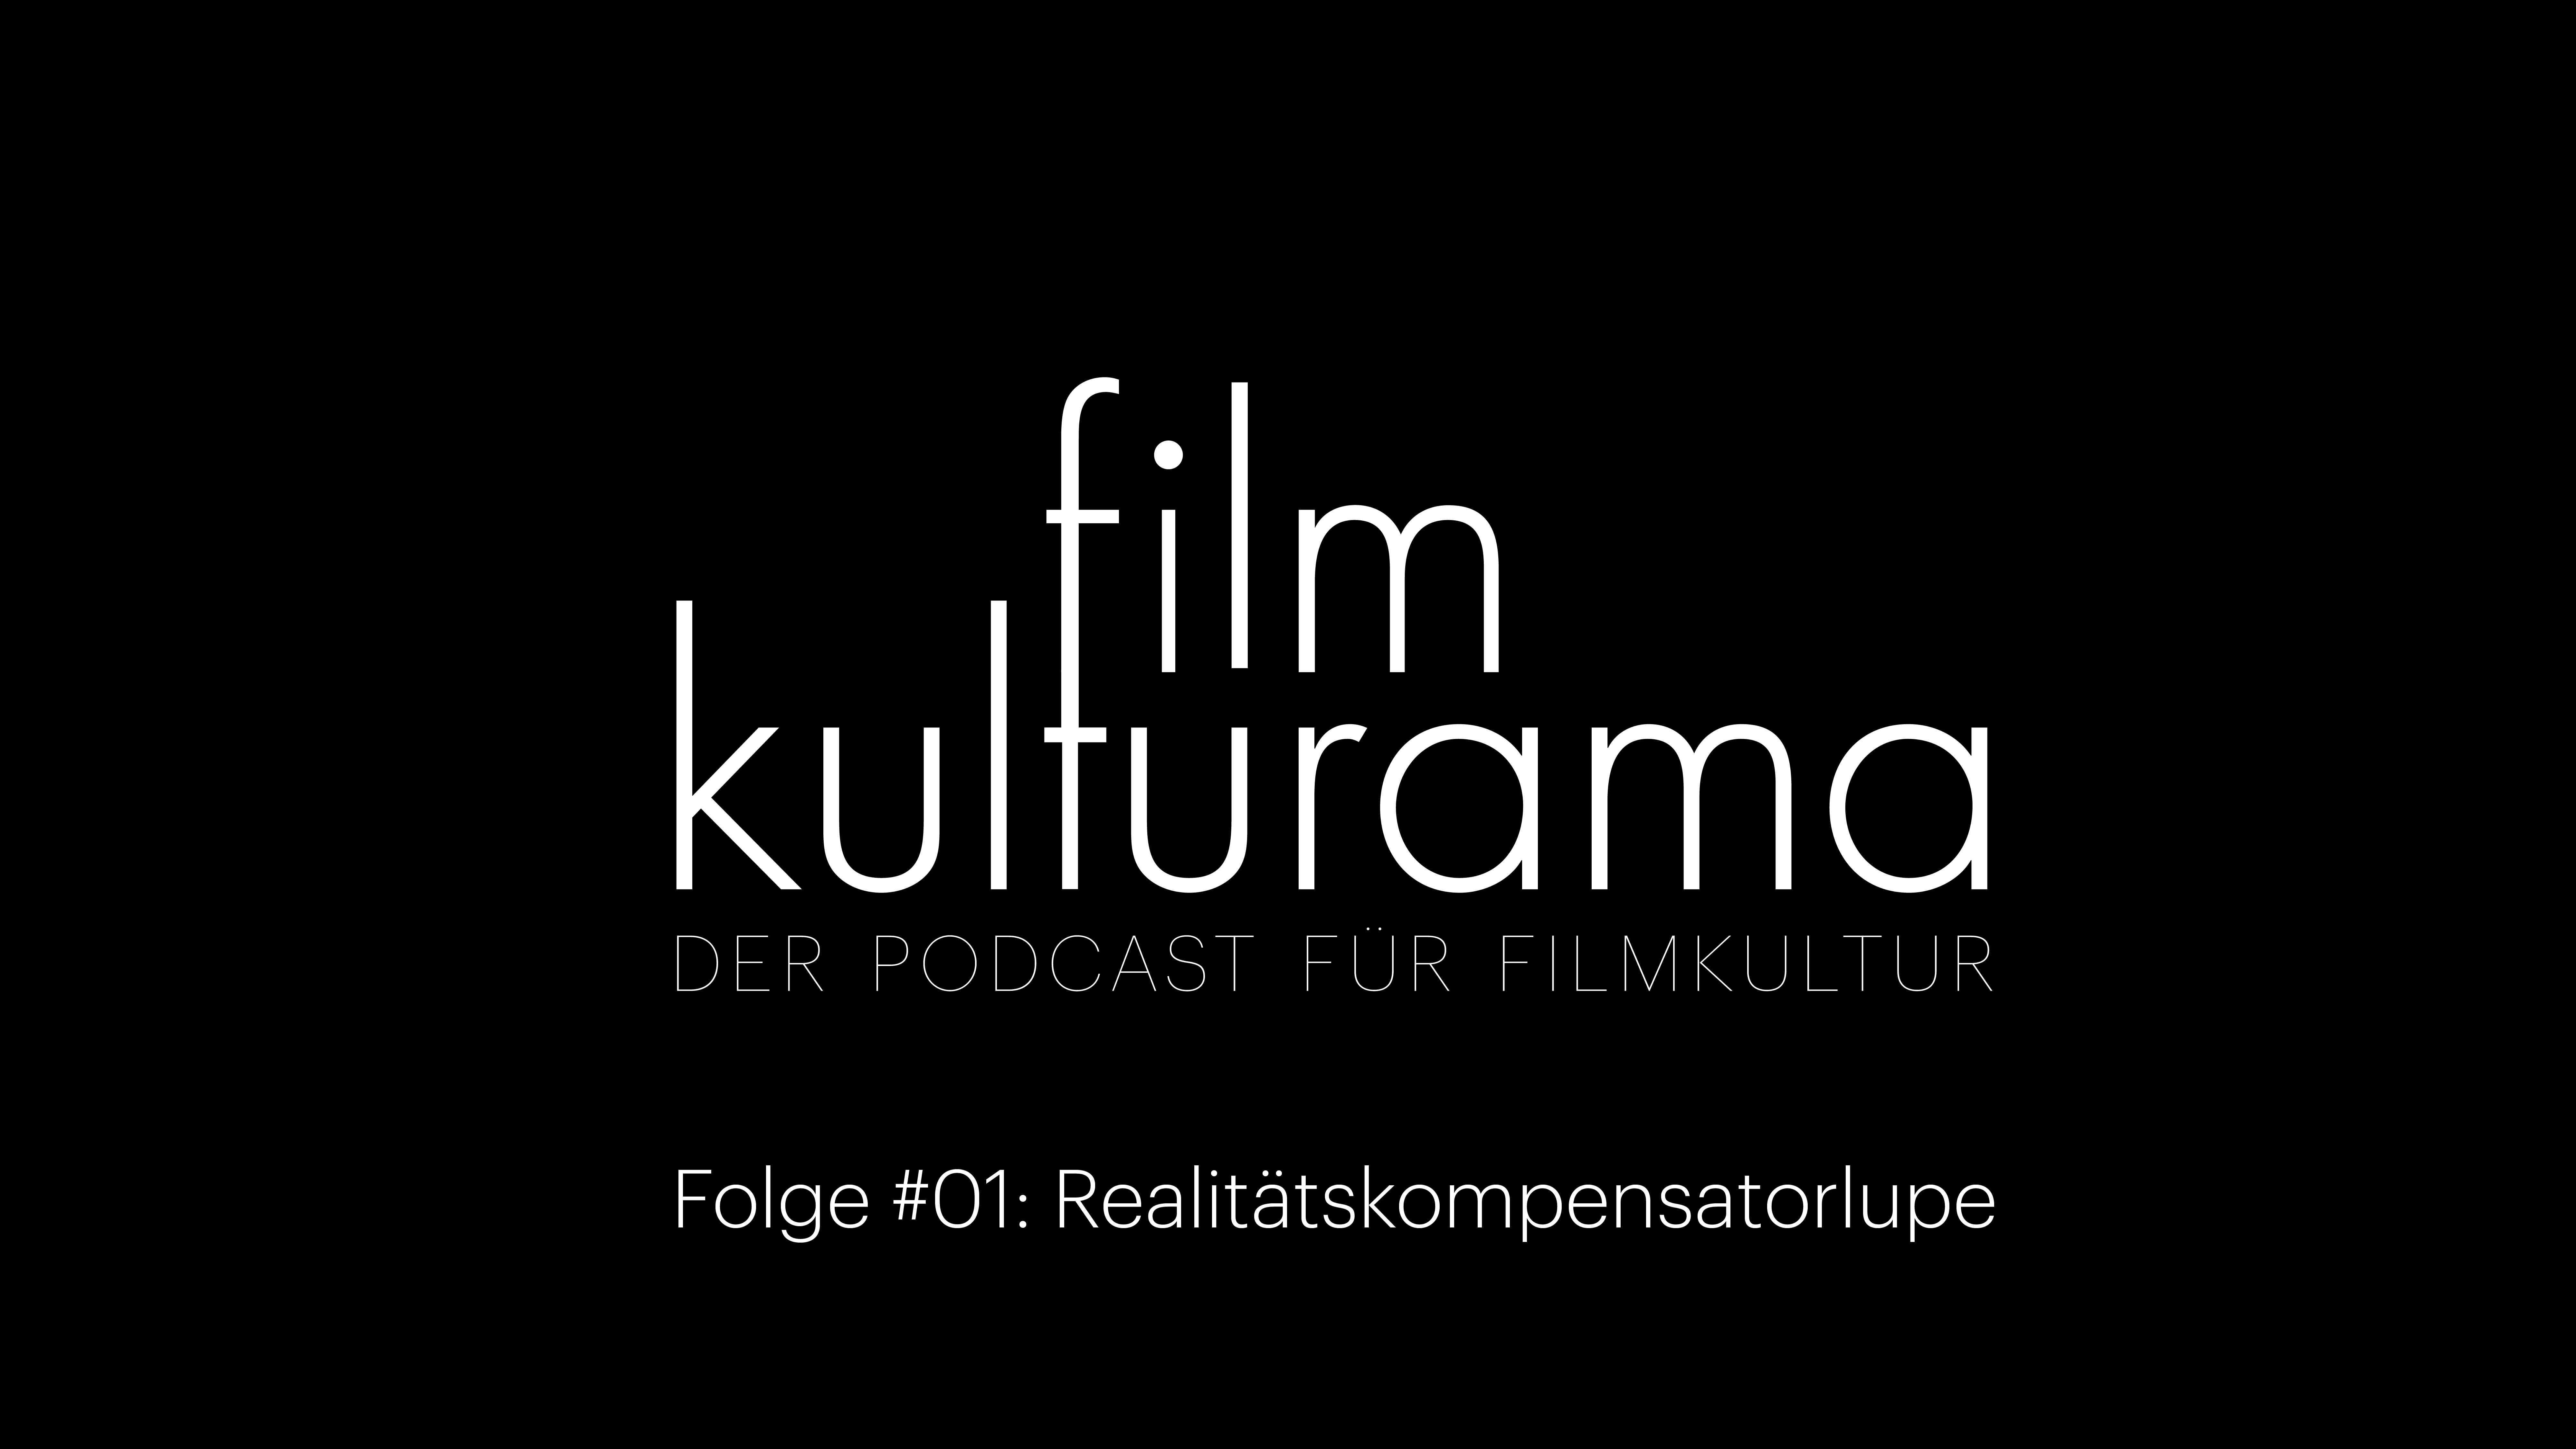 Neuer Podcast Für Filmkultur:  Filmkulturama – Episode #1 Realitätskompensatorlupe.